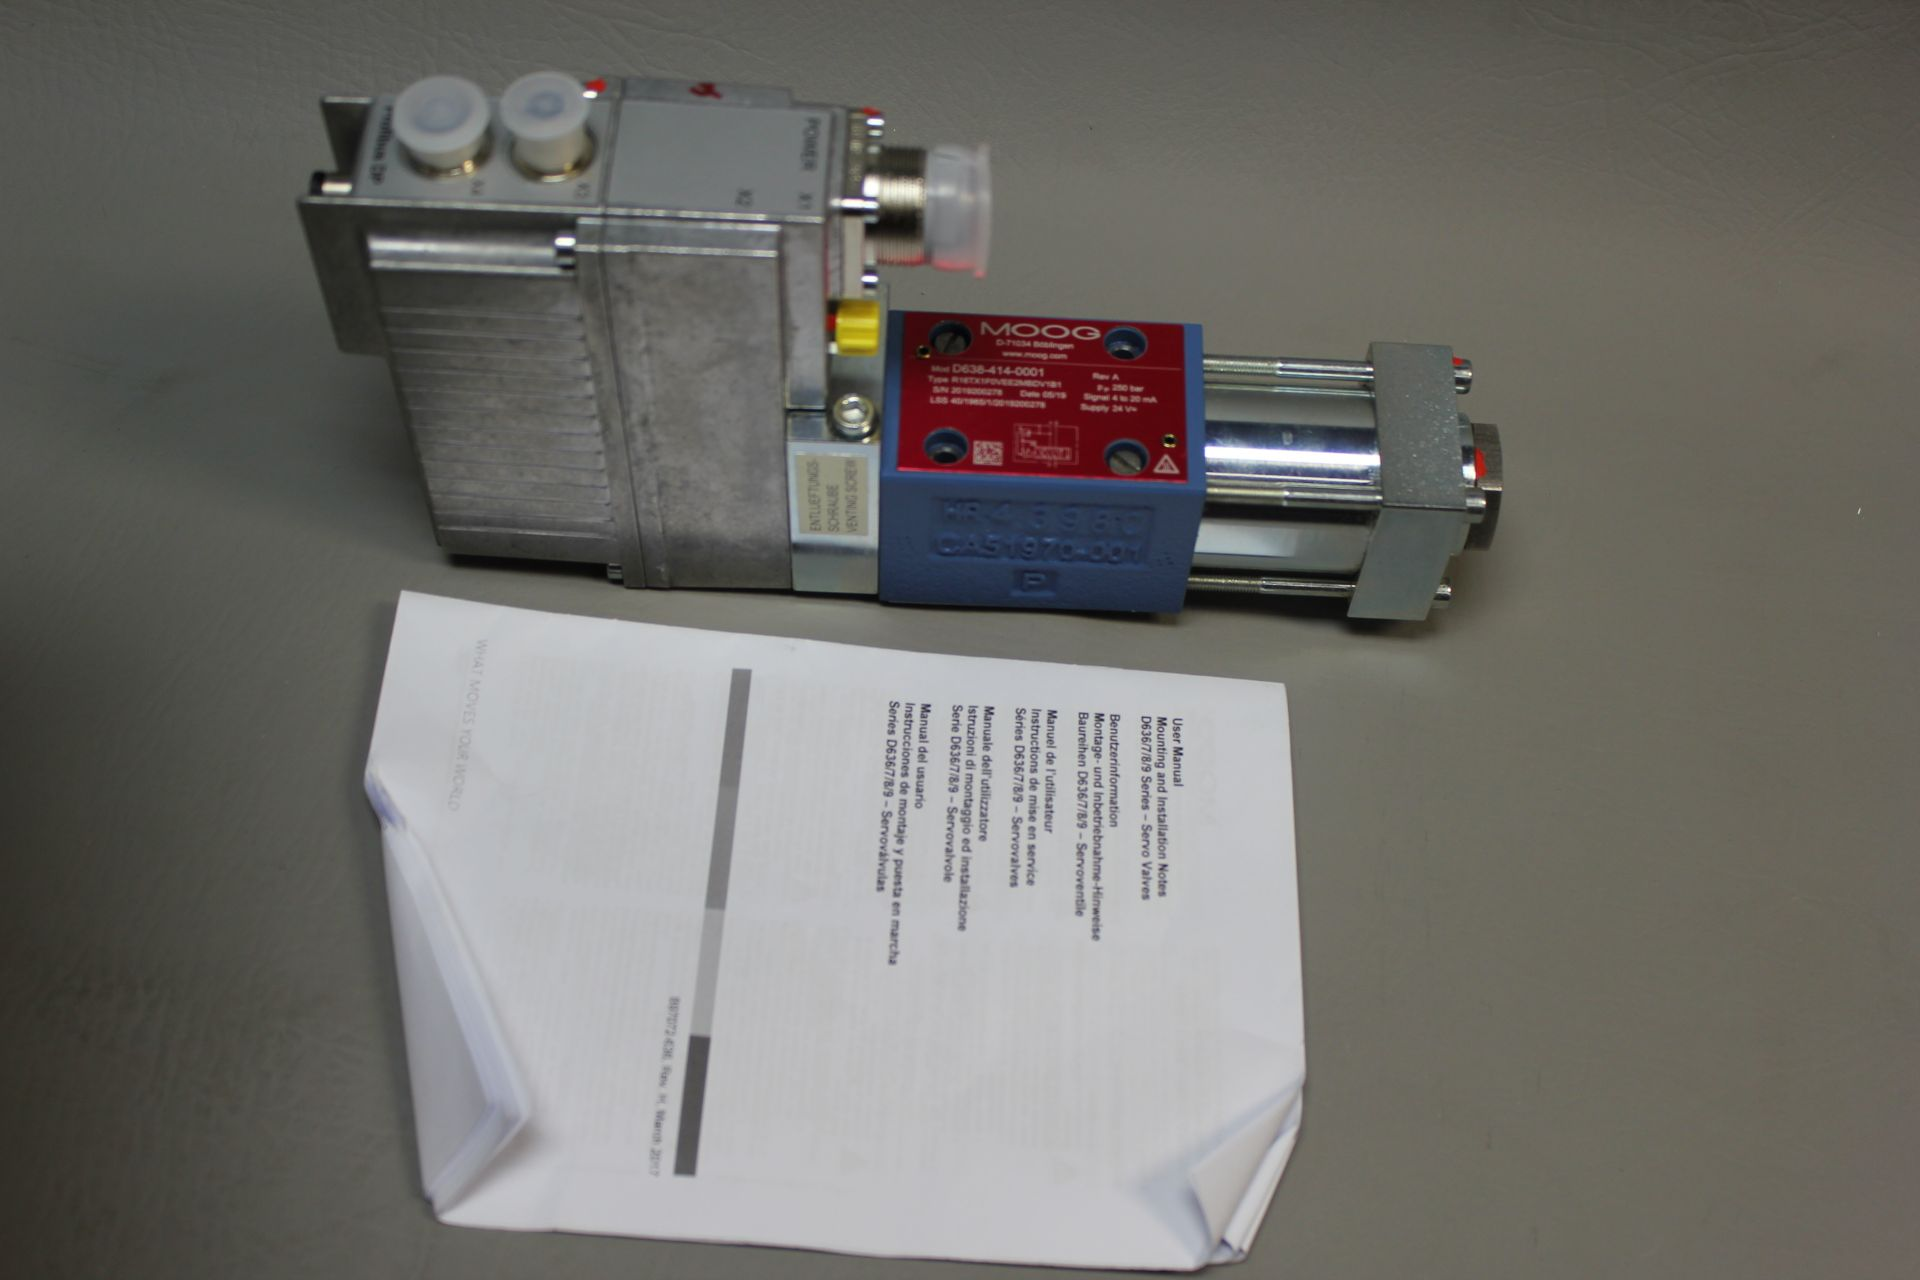 NEW MOOG DIRECT DRIVE DIGITAL CONTROL HYDRAULIC SERVO VALVE - Image 4 of 12